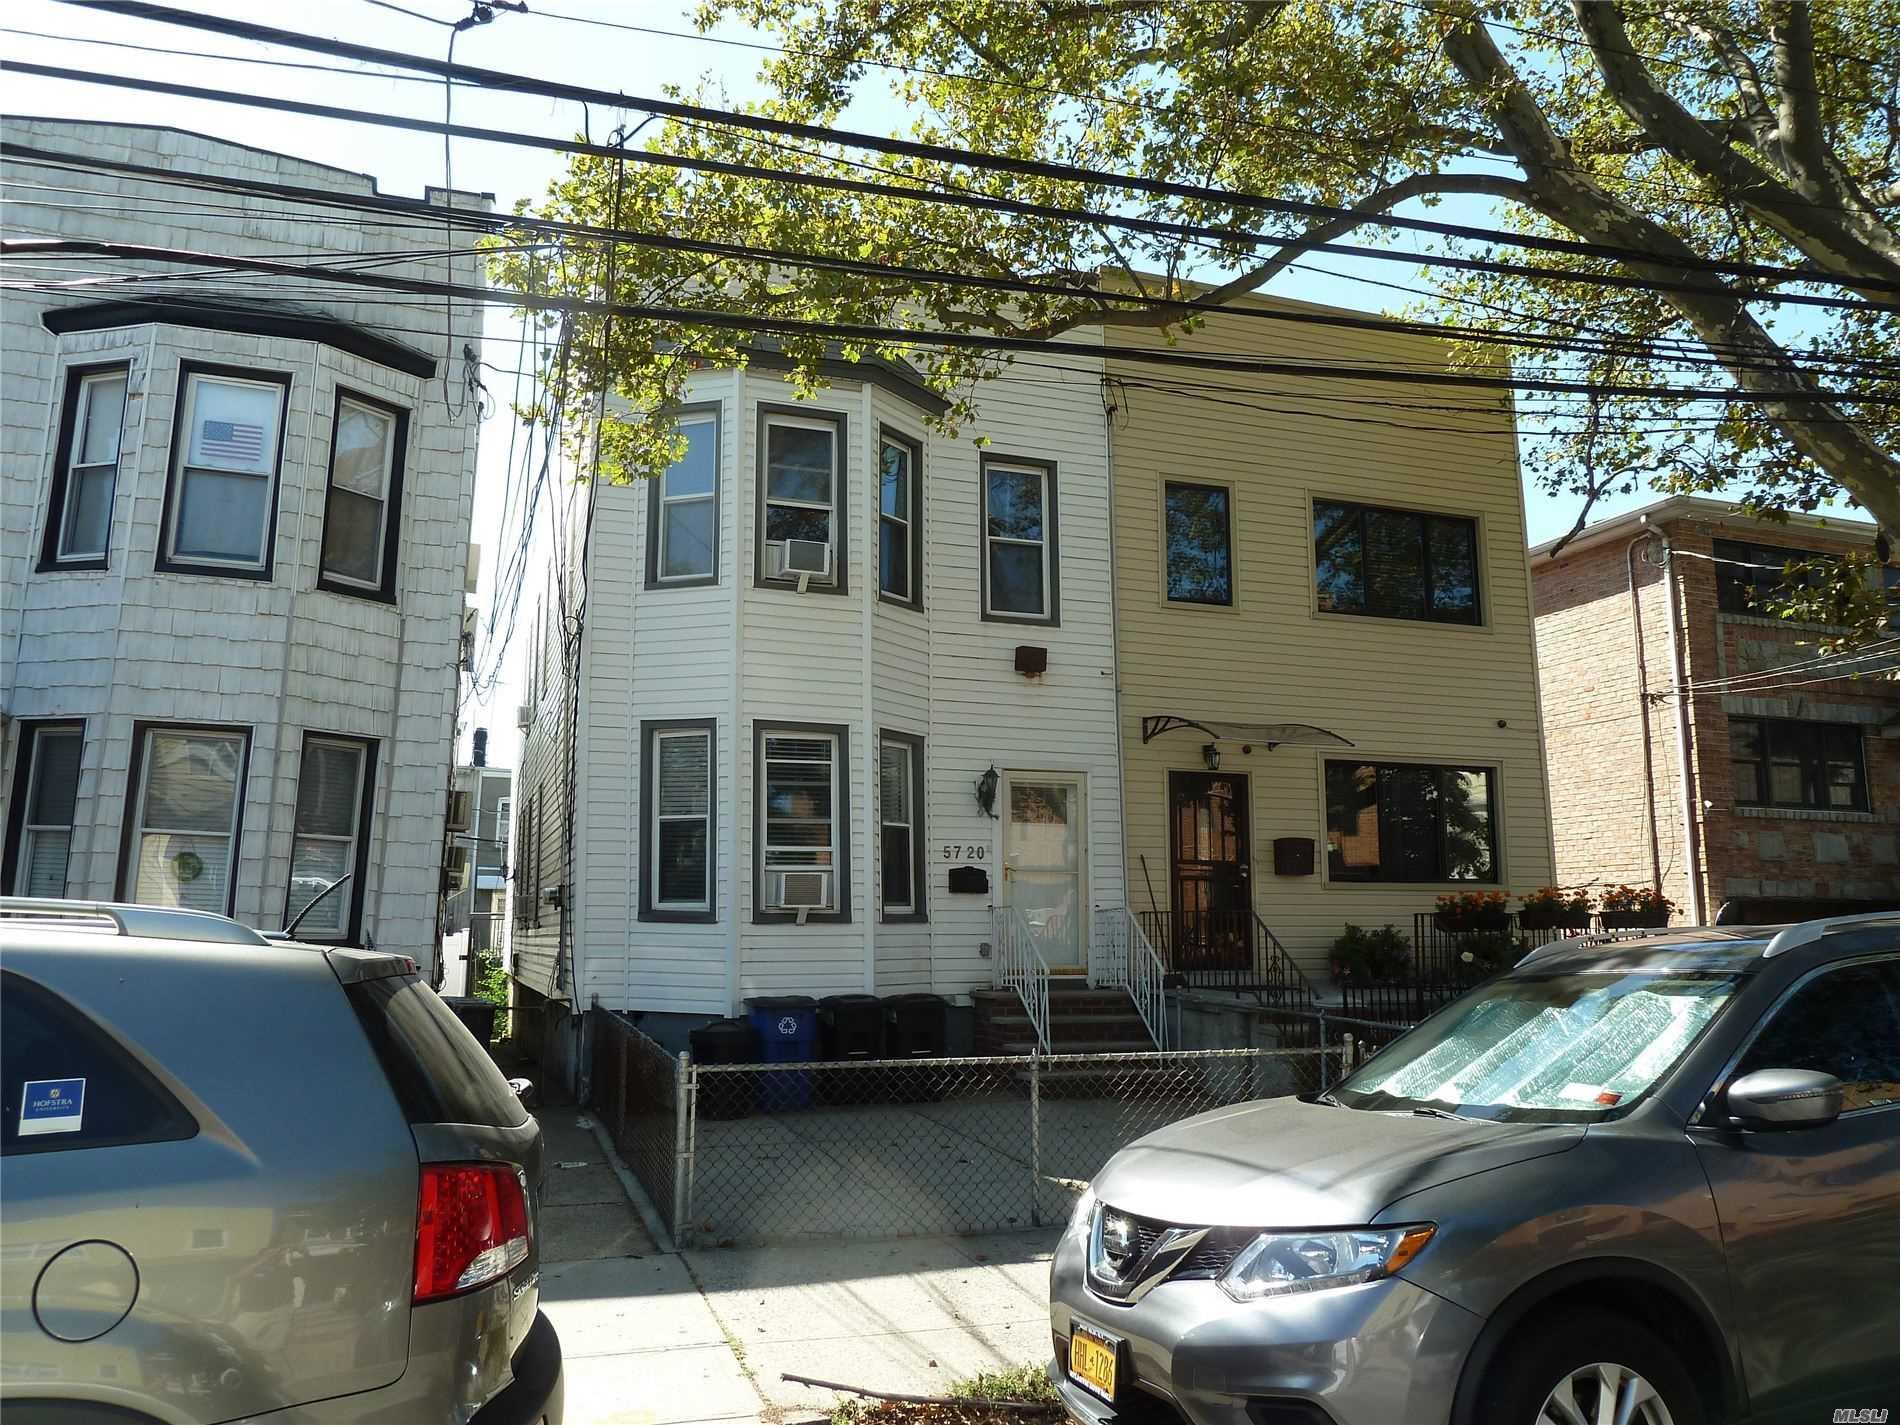 Property for sale at 57-20 69 Lane, Maspeth NY 11378, Maspeth,  New York 11378